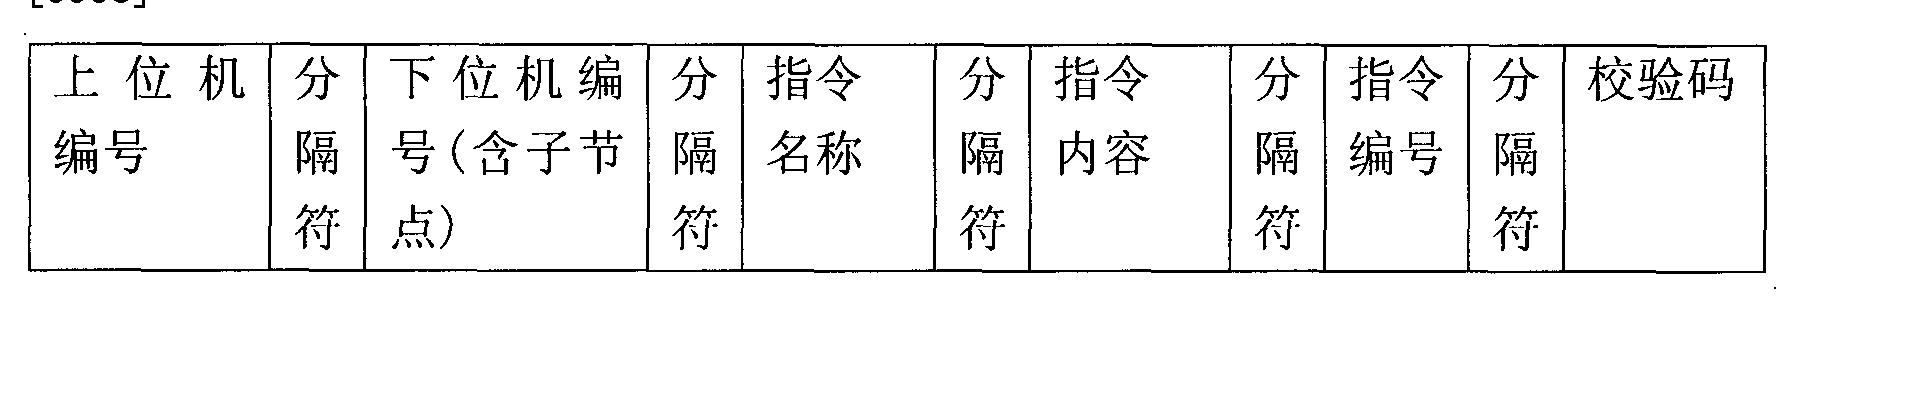 Figure CN102790786AD00072